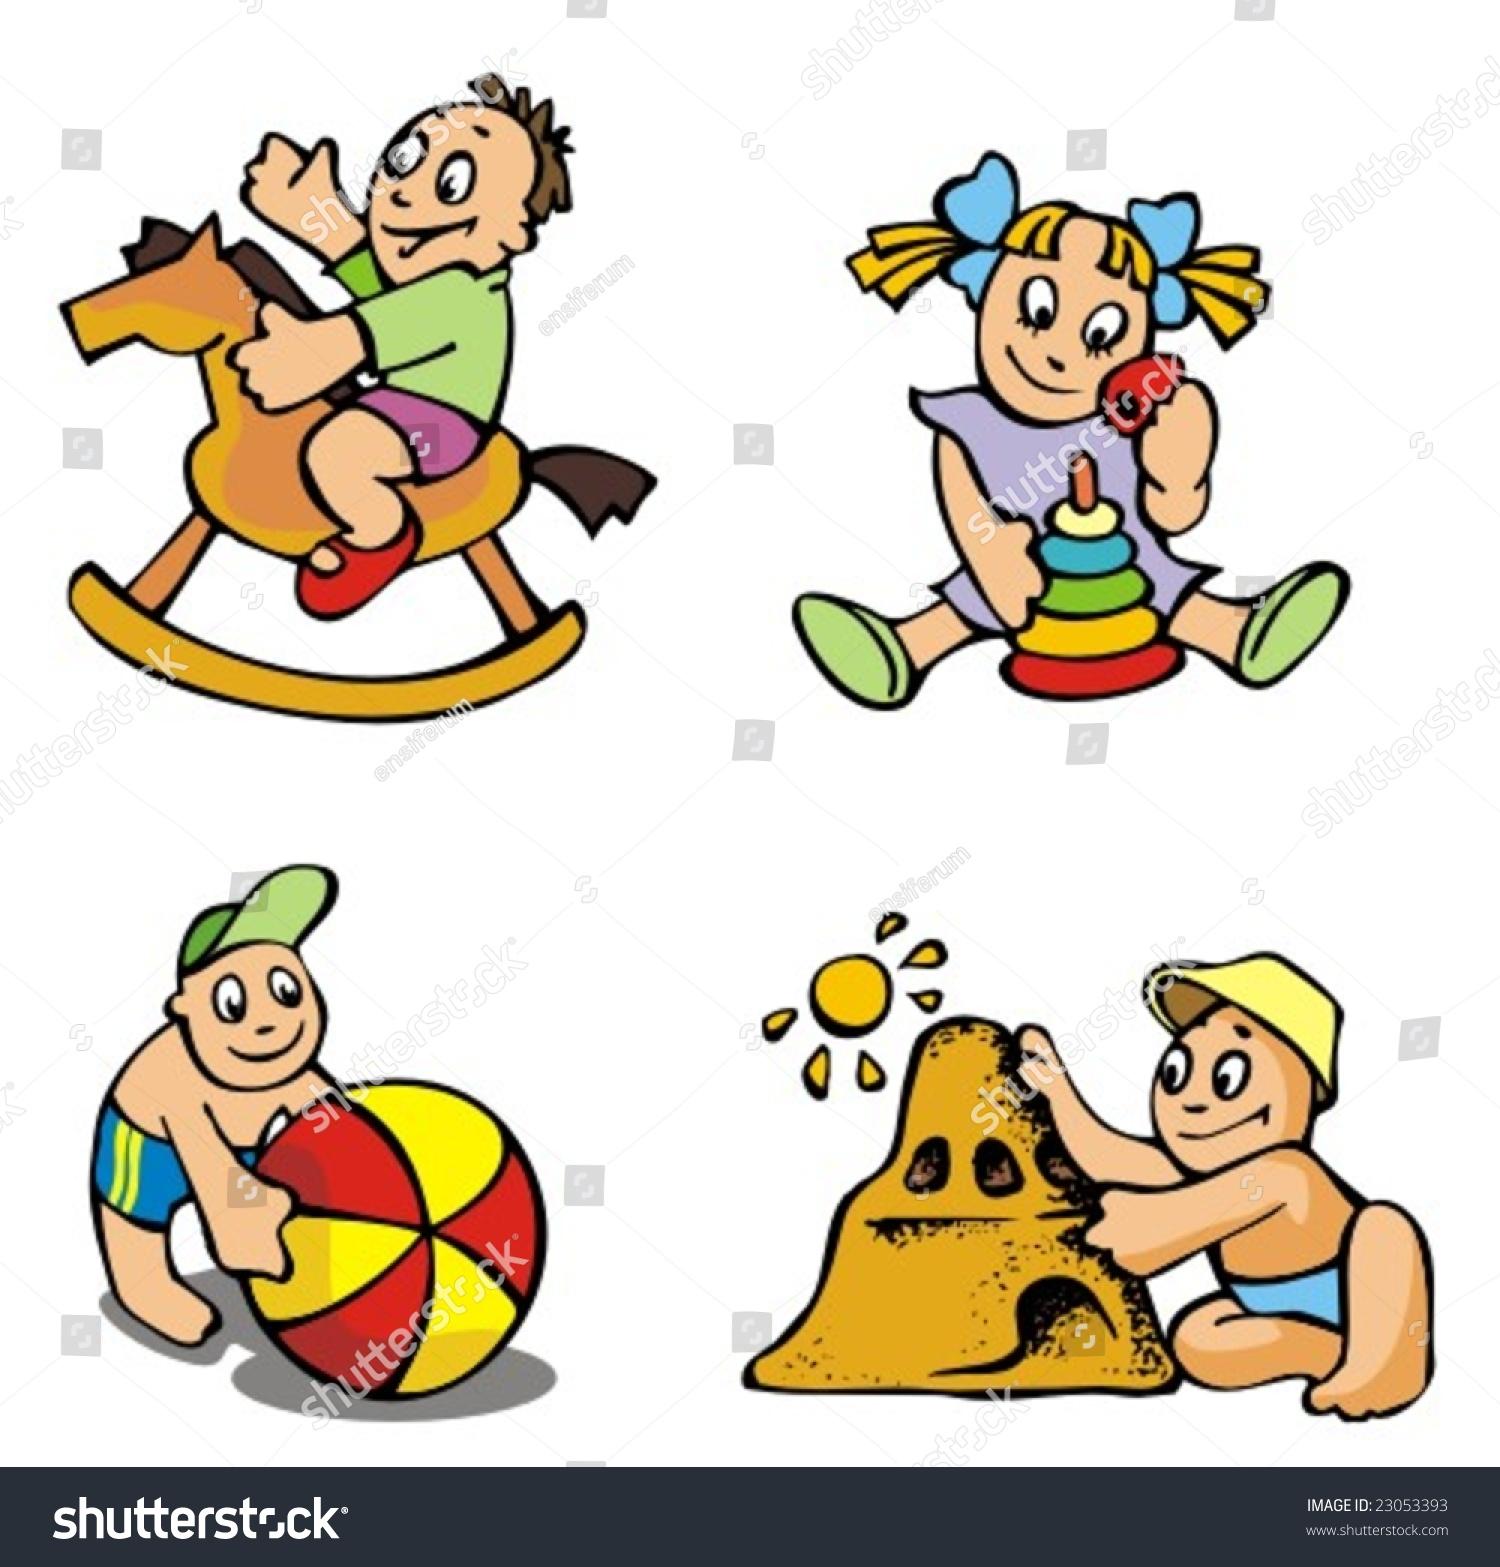 set of cartoon drawing of children babies different activities vector illustration - Cartoon Drawing For Children